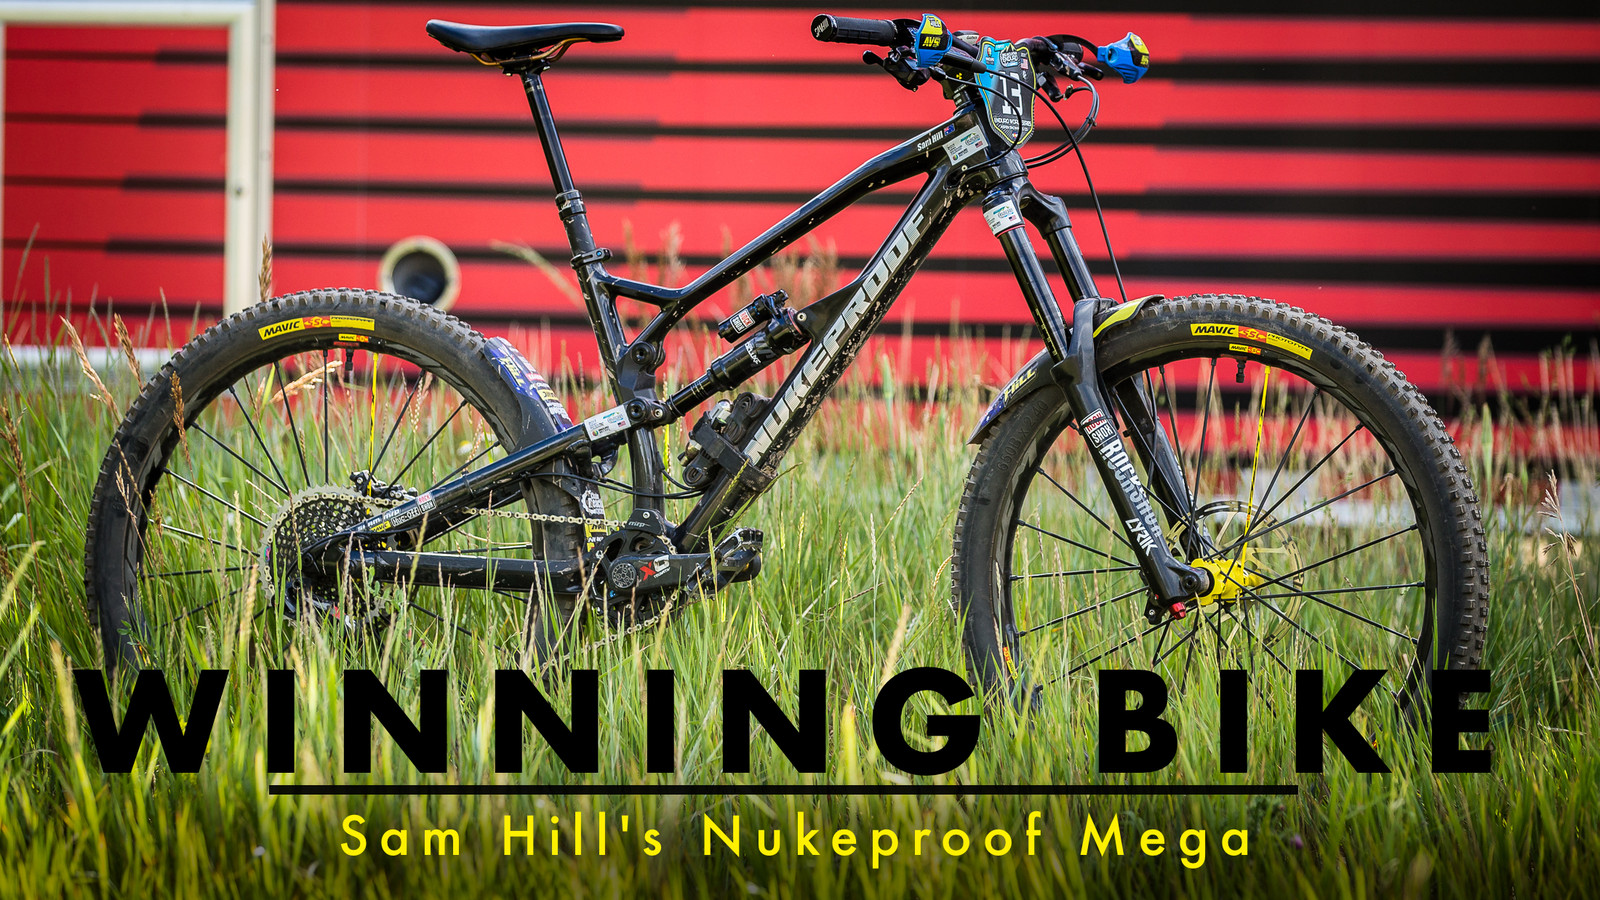 WINNING BIKE - Sam Hill's Prototype Nukeproof Mega